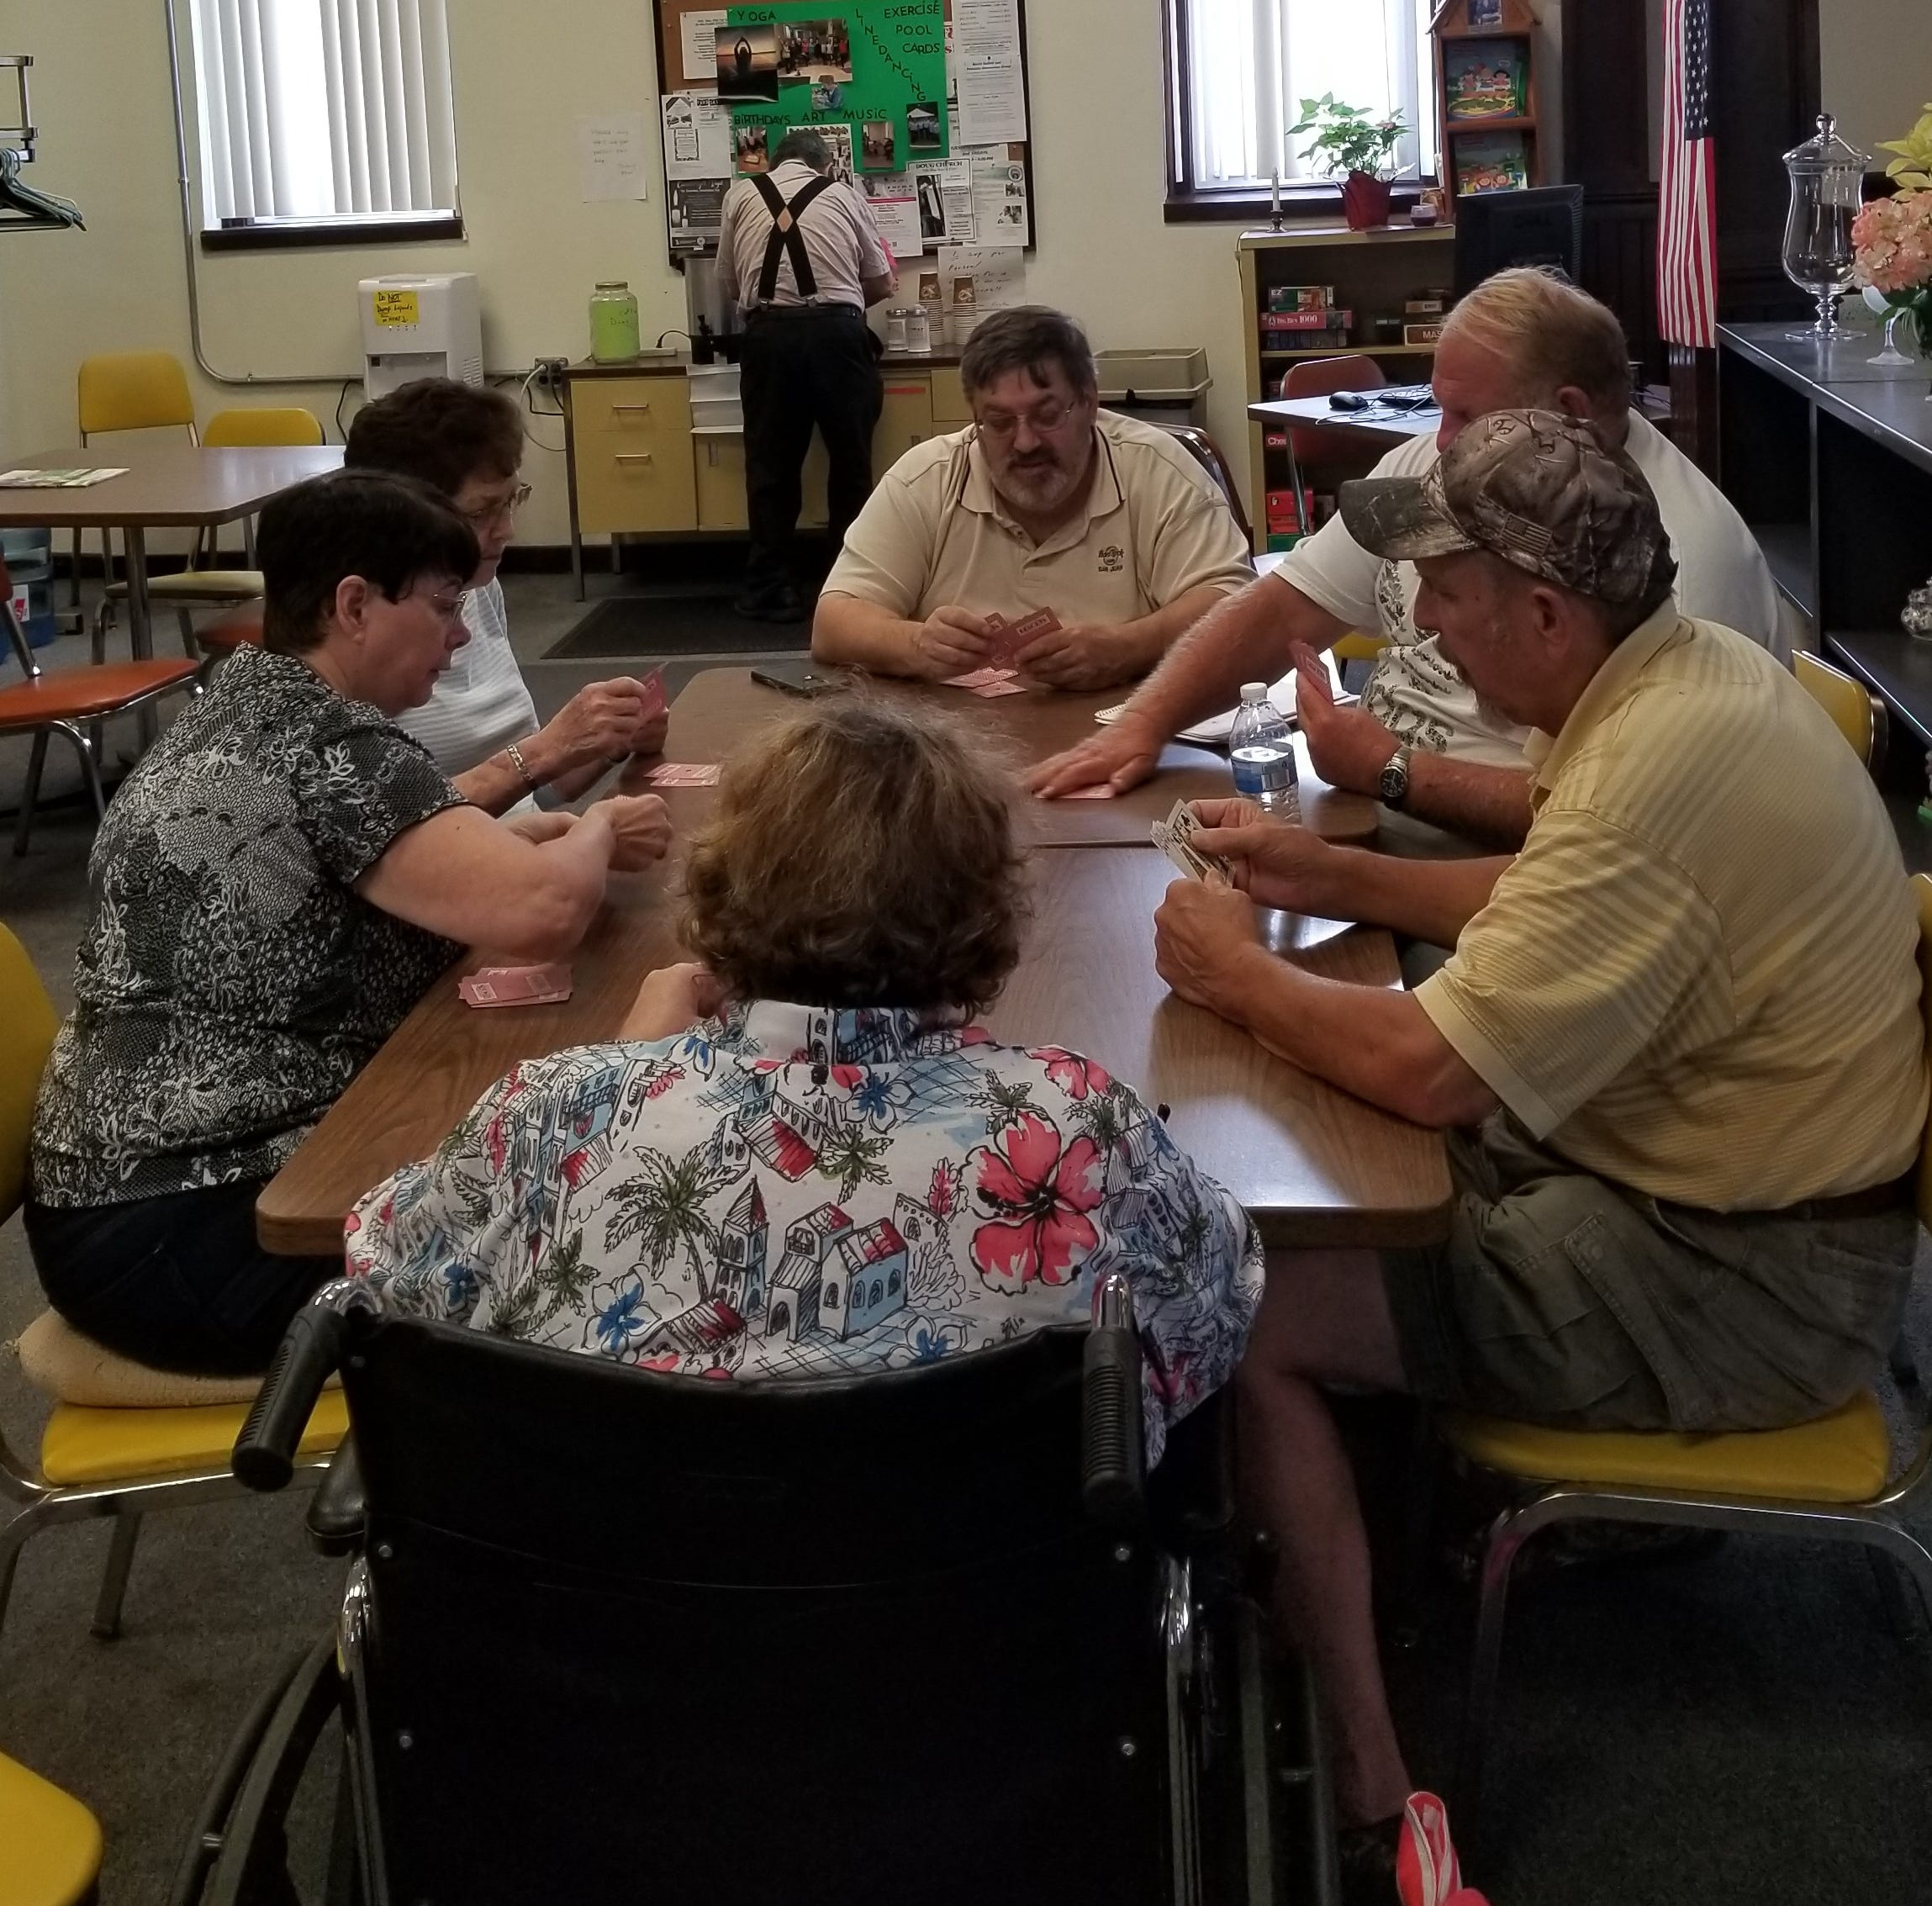 Vineland Senior Center offers a variety of activities